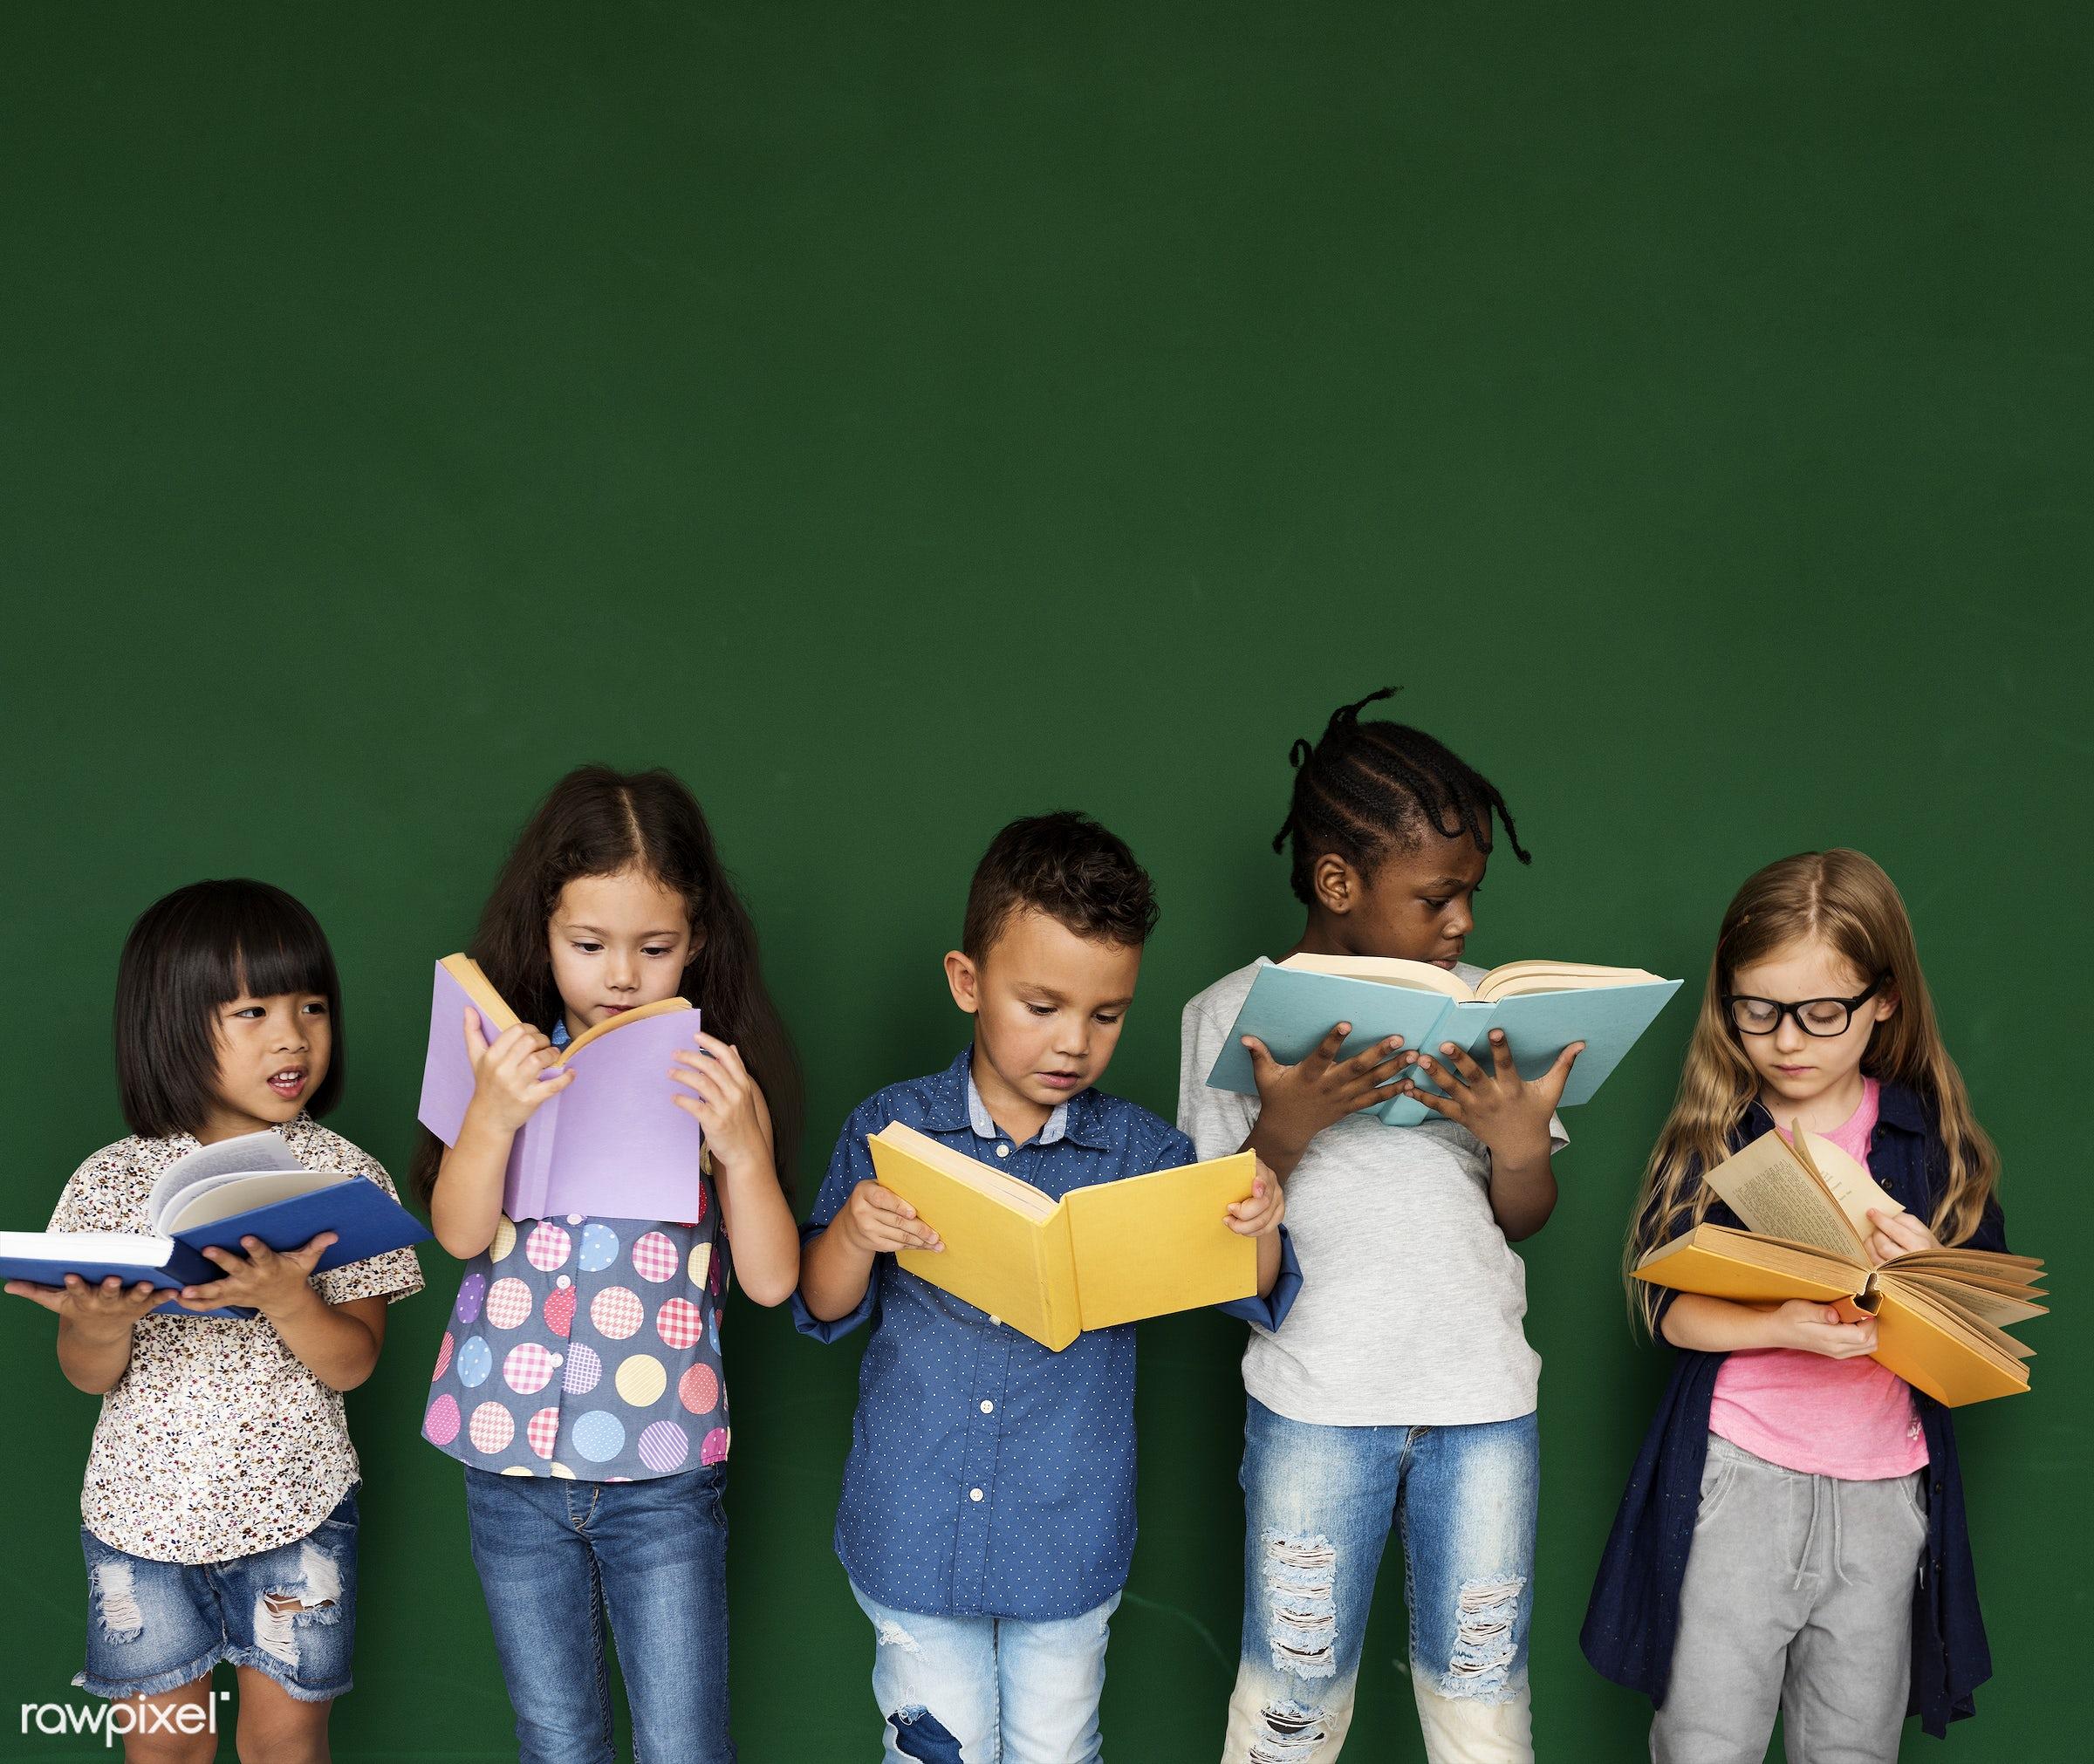 blackboard, child, education, reading, adorable, book, bookworm, boy, casual, chalkboard, childhood, children, classmates,...